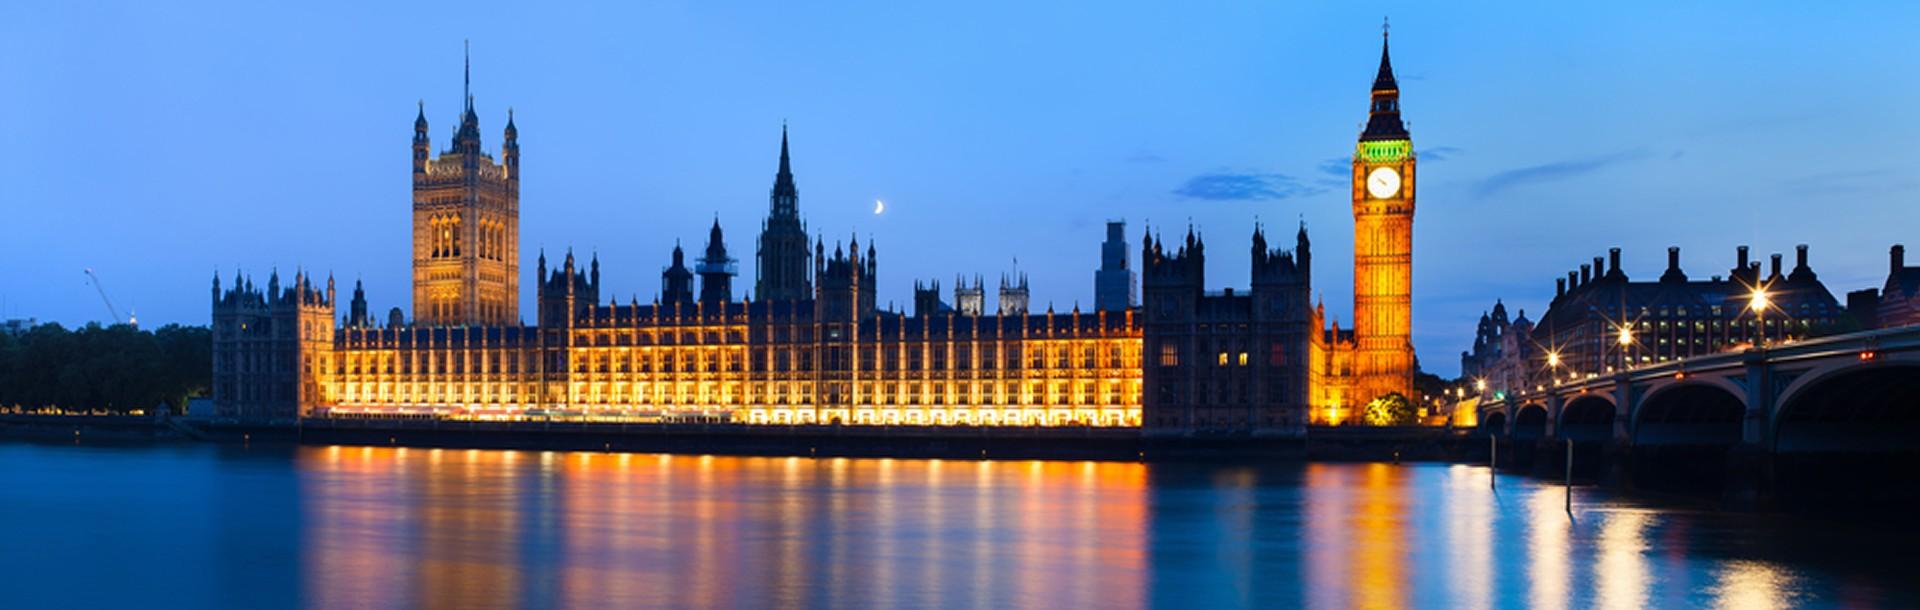 Big Ben & Houses of Parliament, London